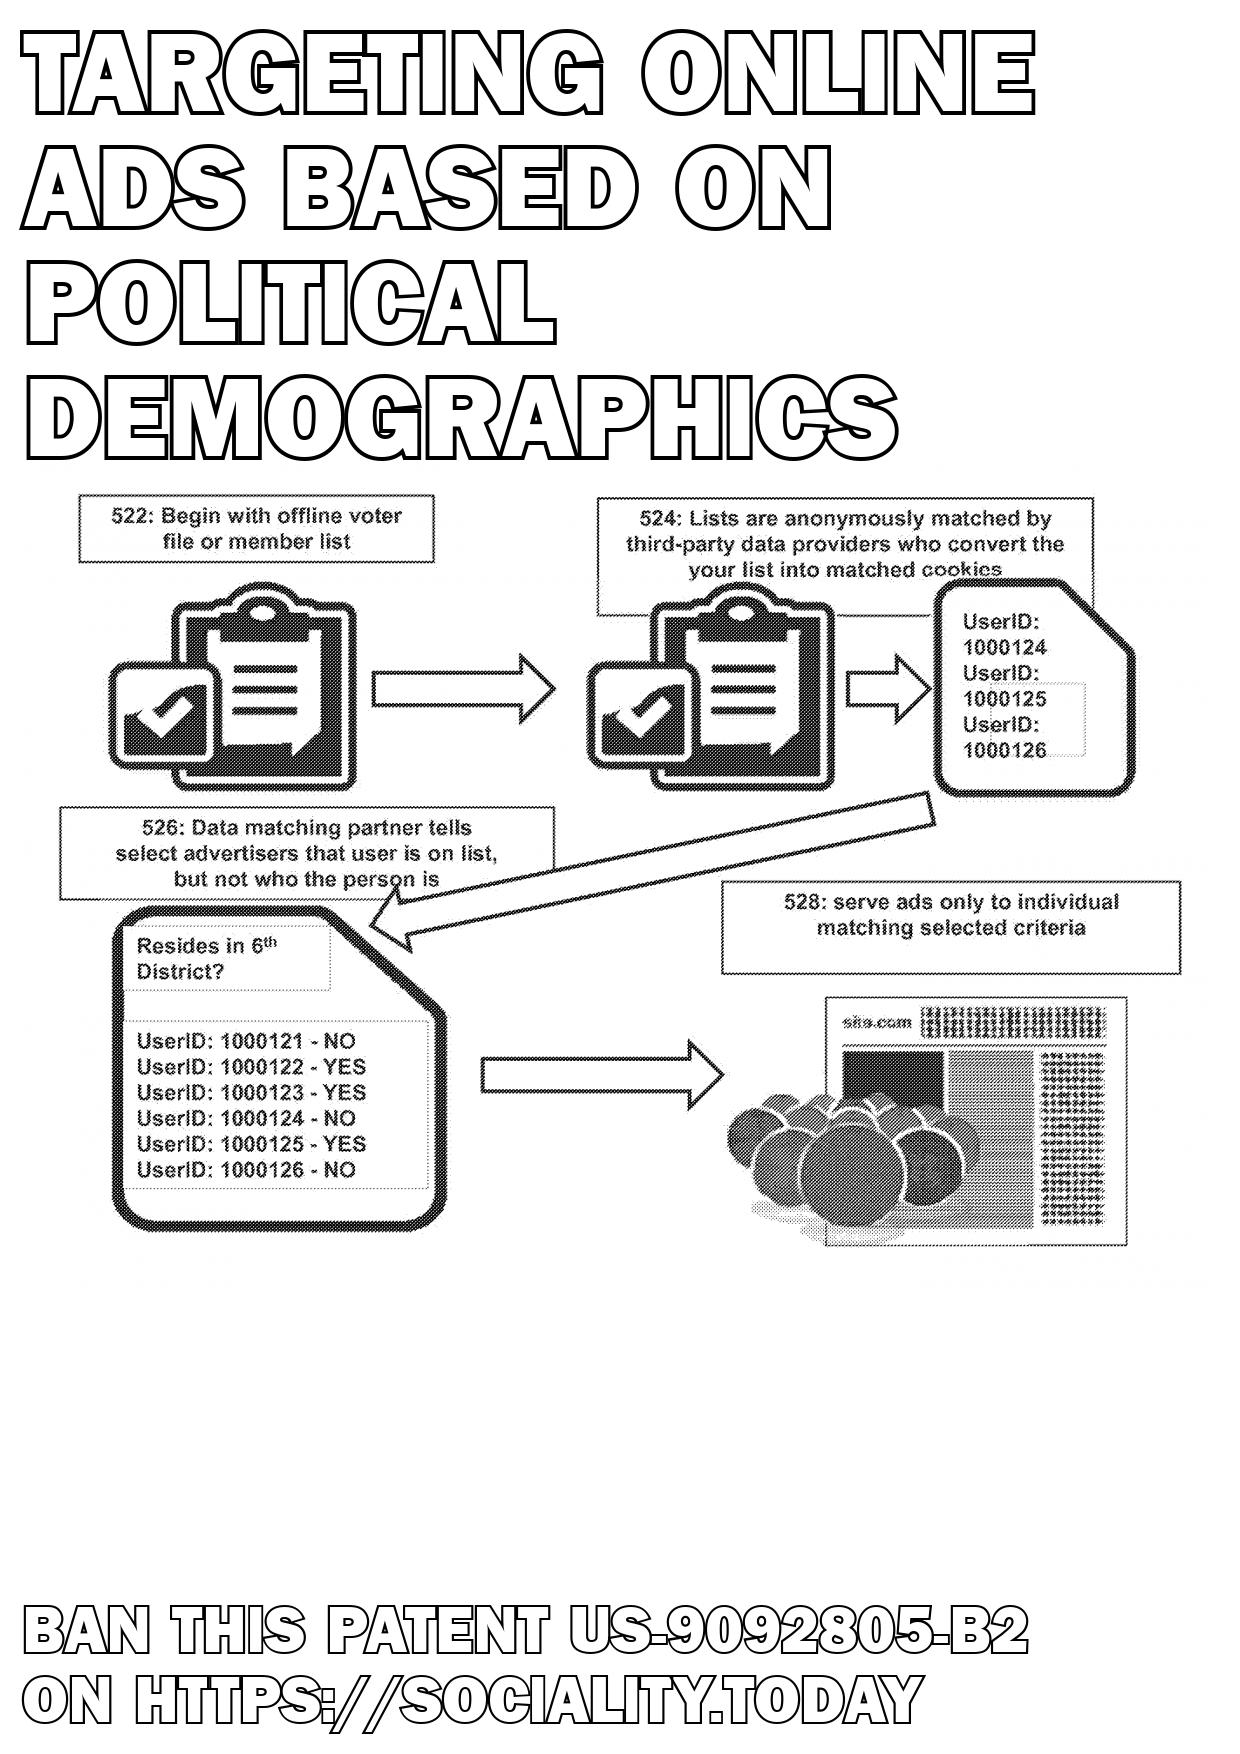 Targeting online ads based on political demographics  - US-9092805-B2